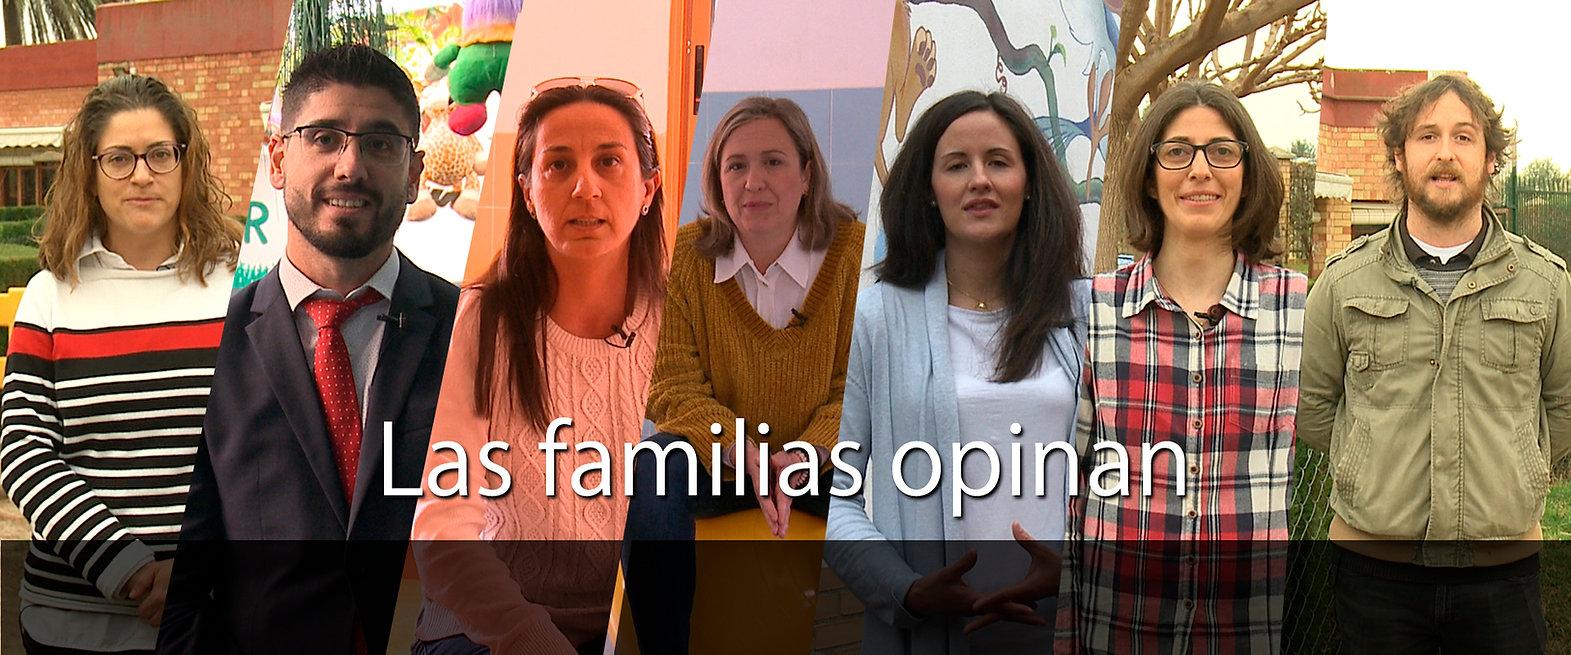 LAS FAMILIAS OPINAN.jpg